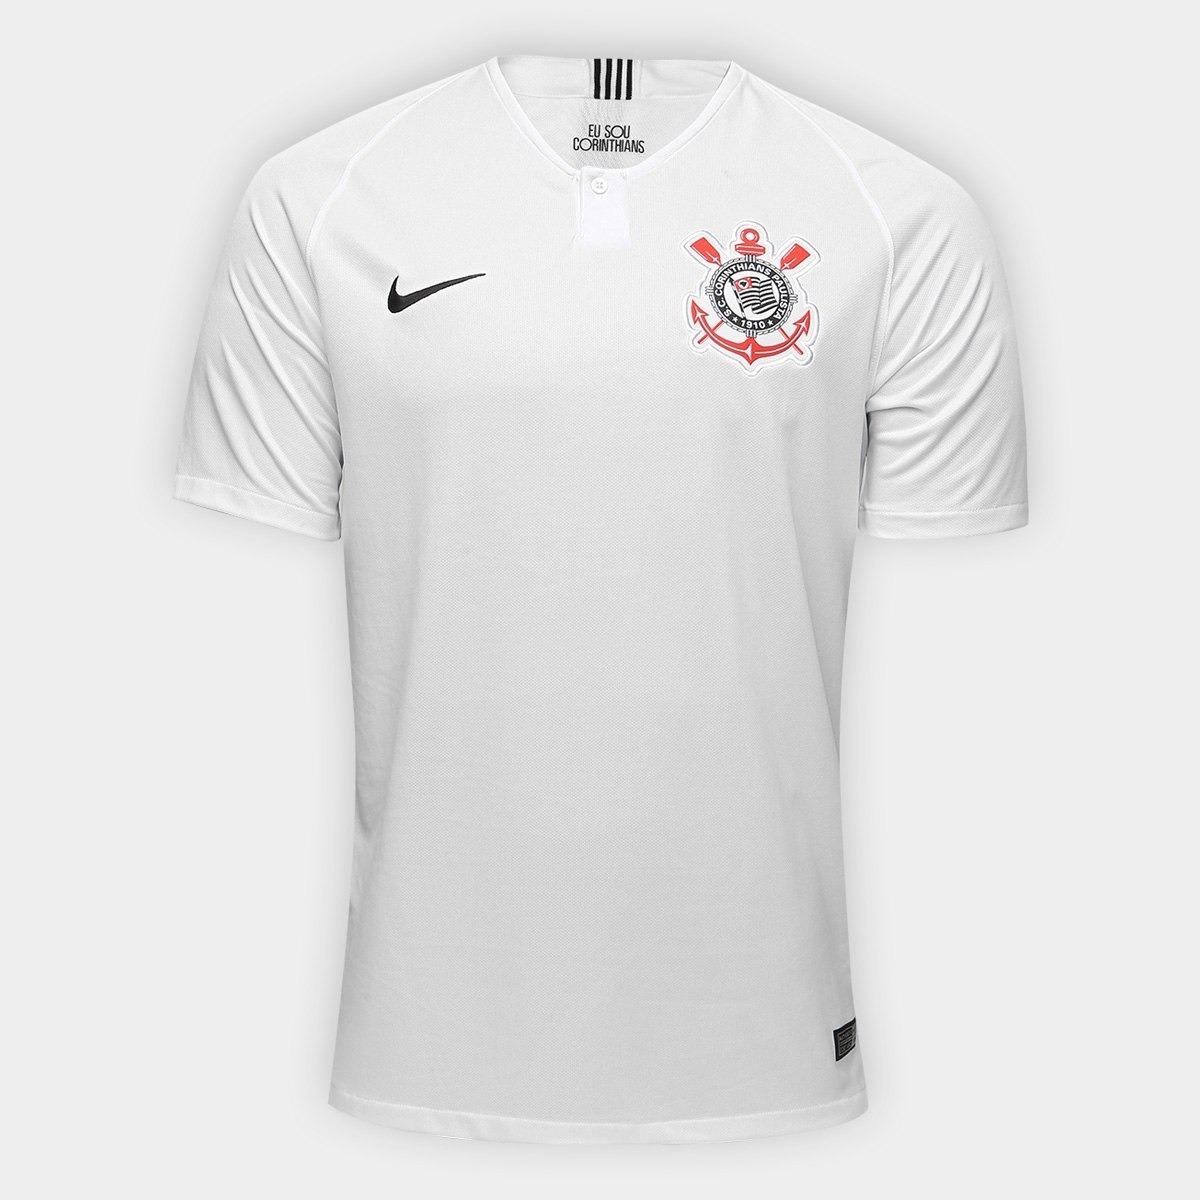 834c433af camisa corinthians 2018 s nº 2018 importada. Carregando zoom.